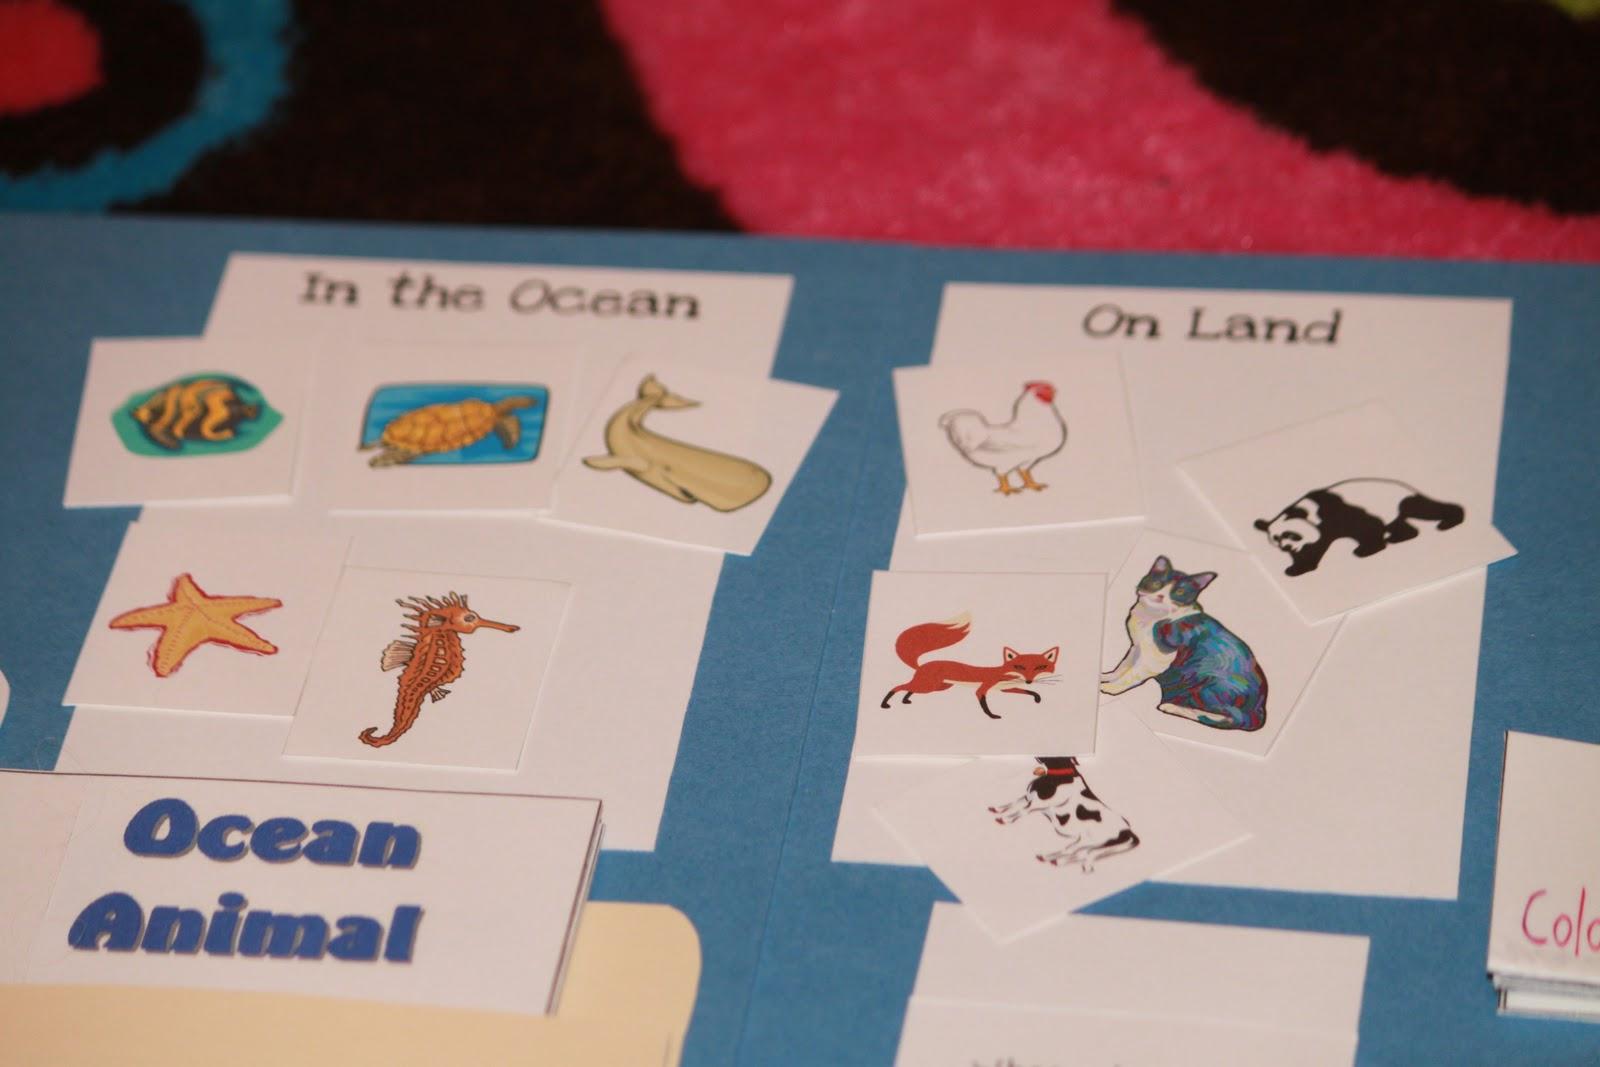 Miller Academy Sea World And Ocean Animals